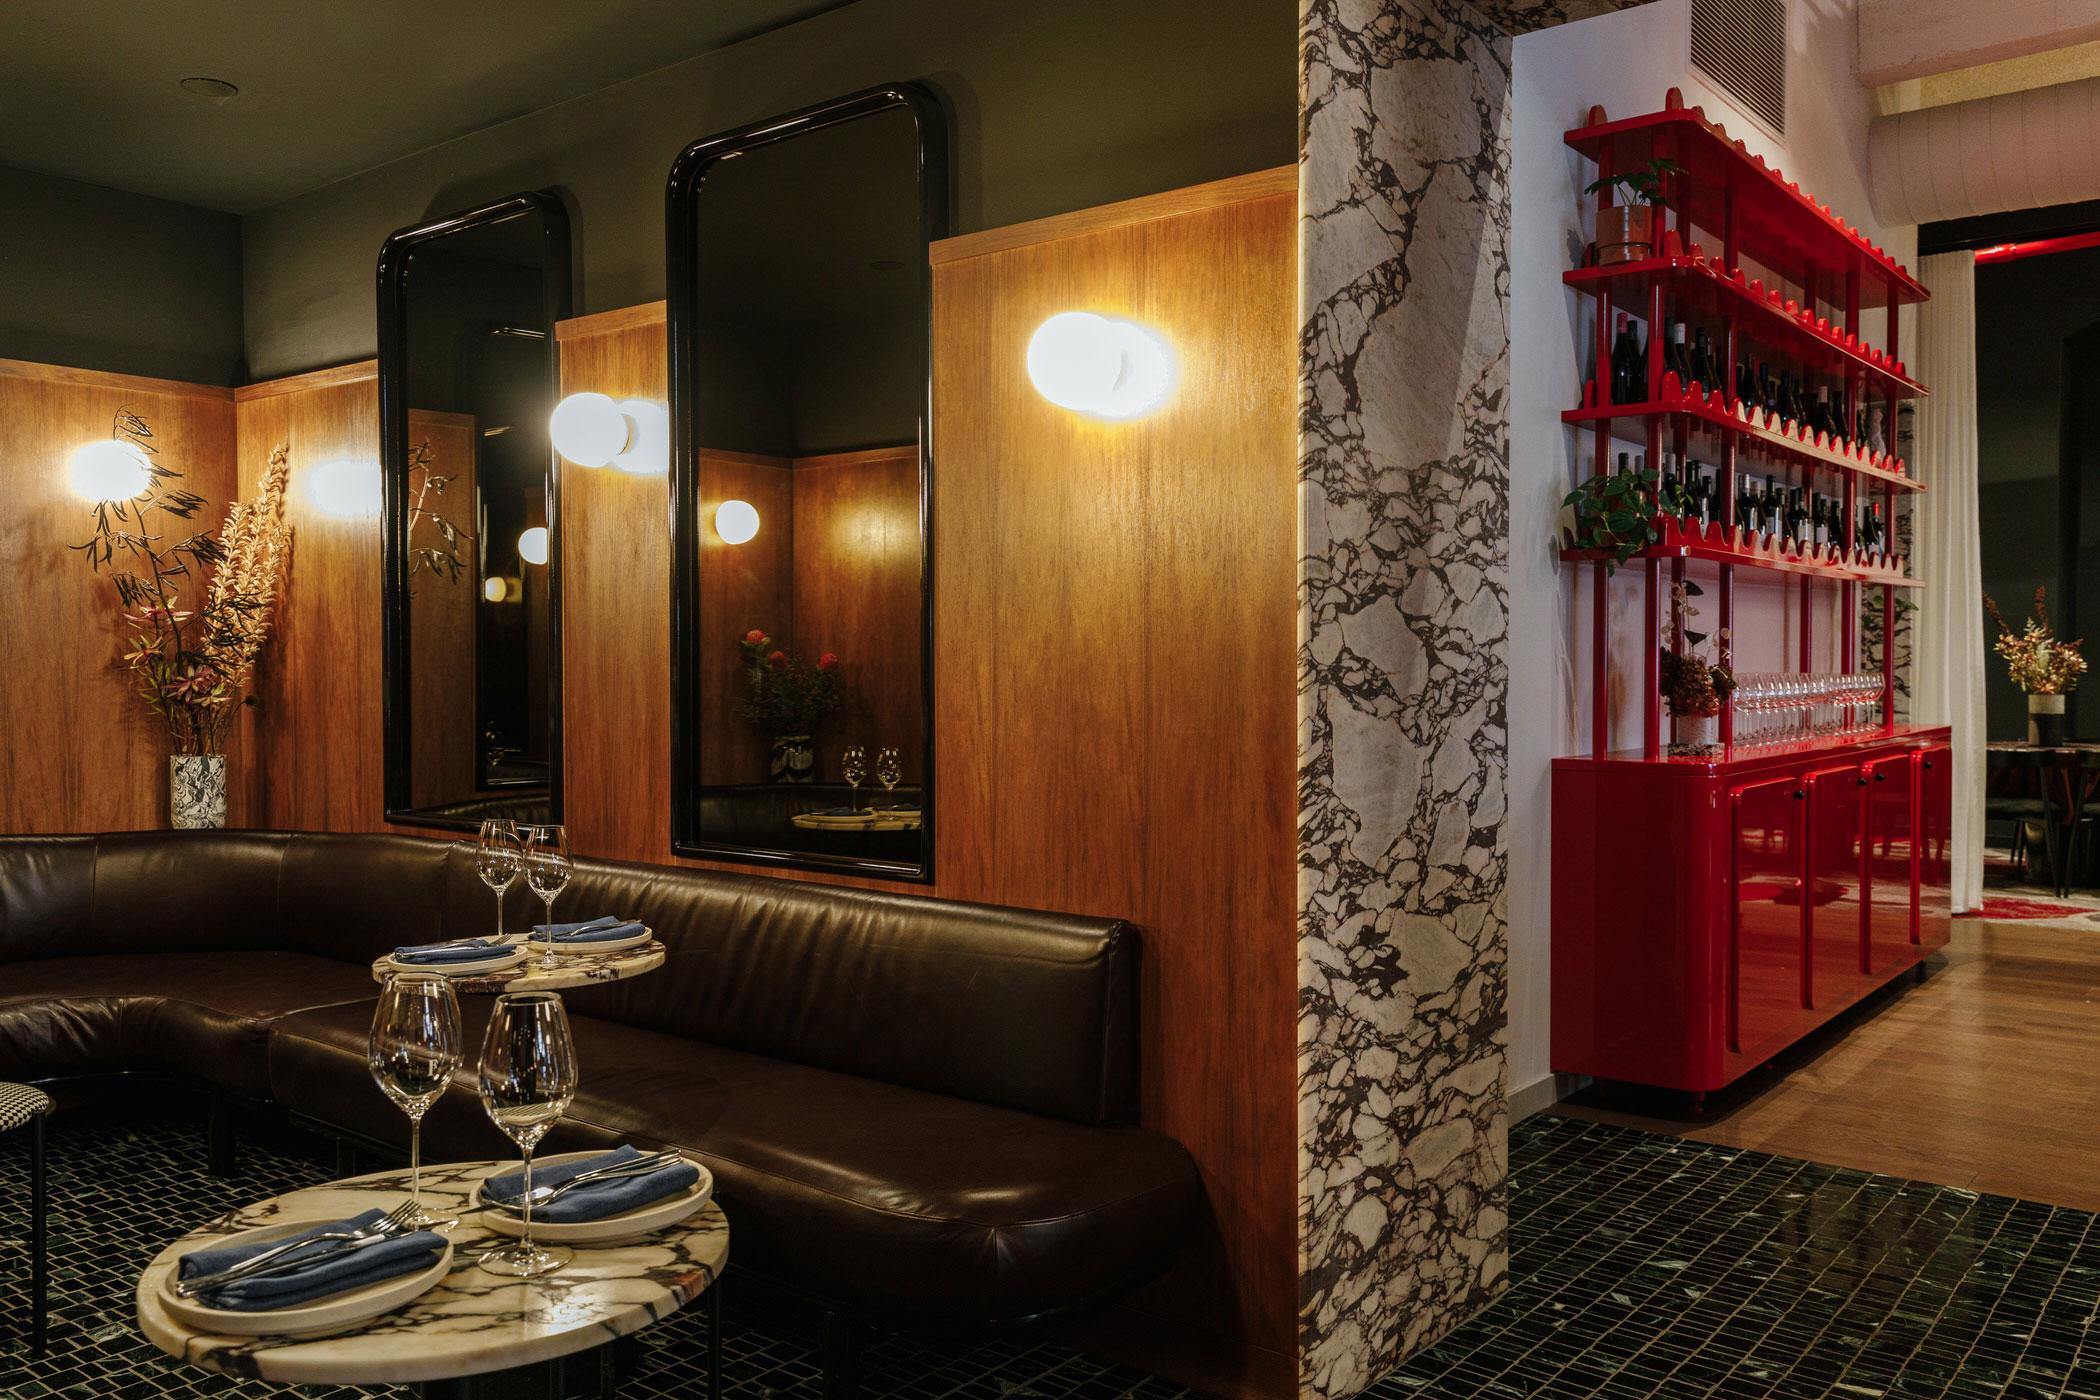 Studio Gram Fugazzi Adelaide Restaurant Bar Photo Jonathan Vdk Yellowtrace 16